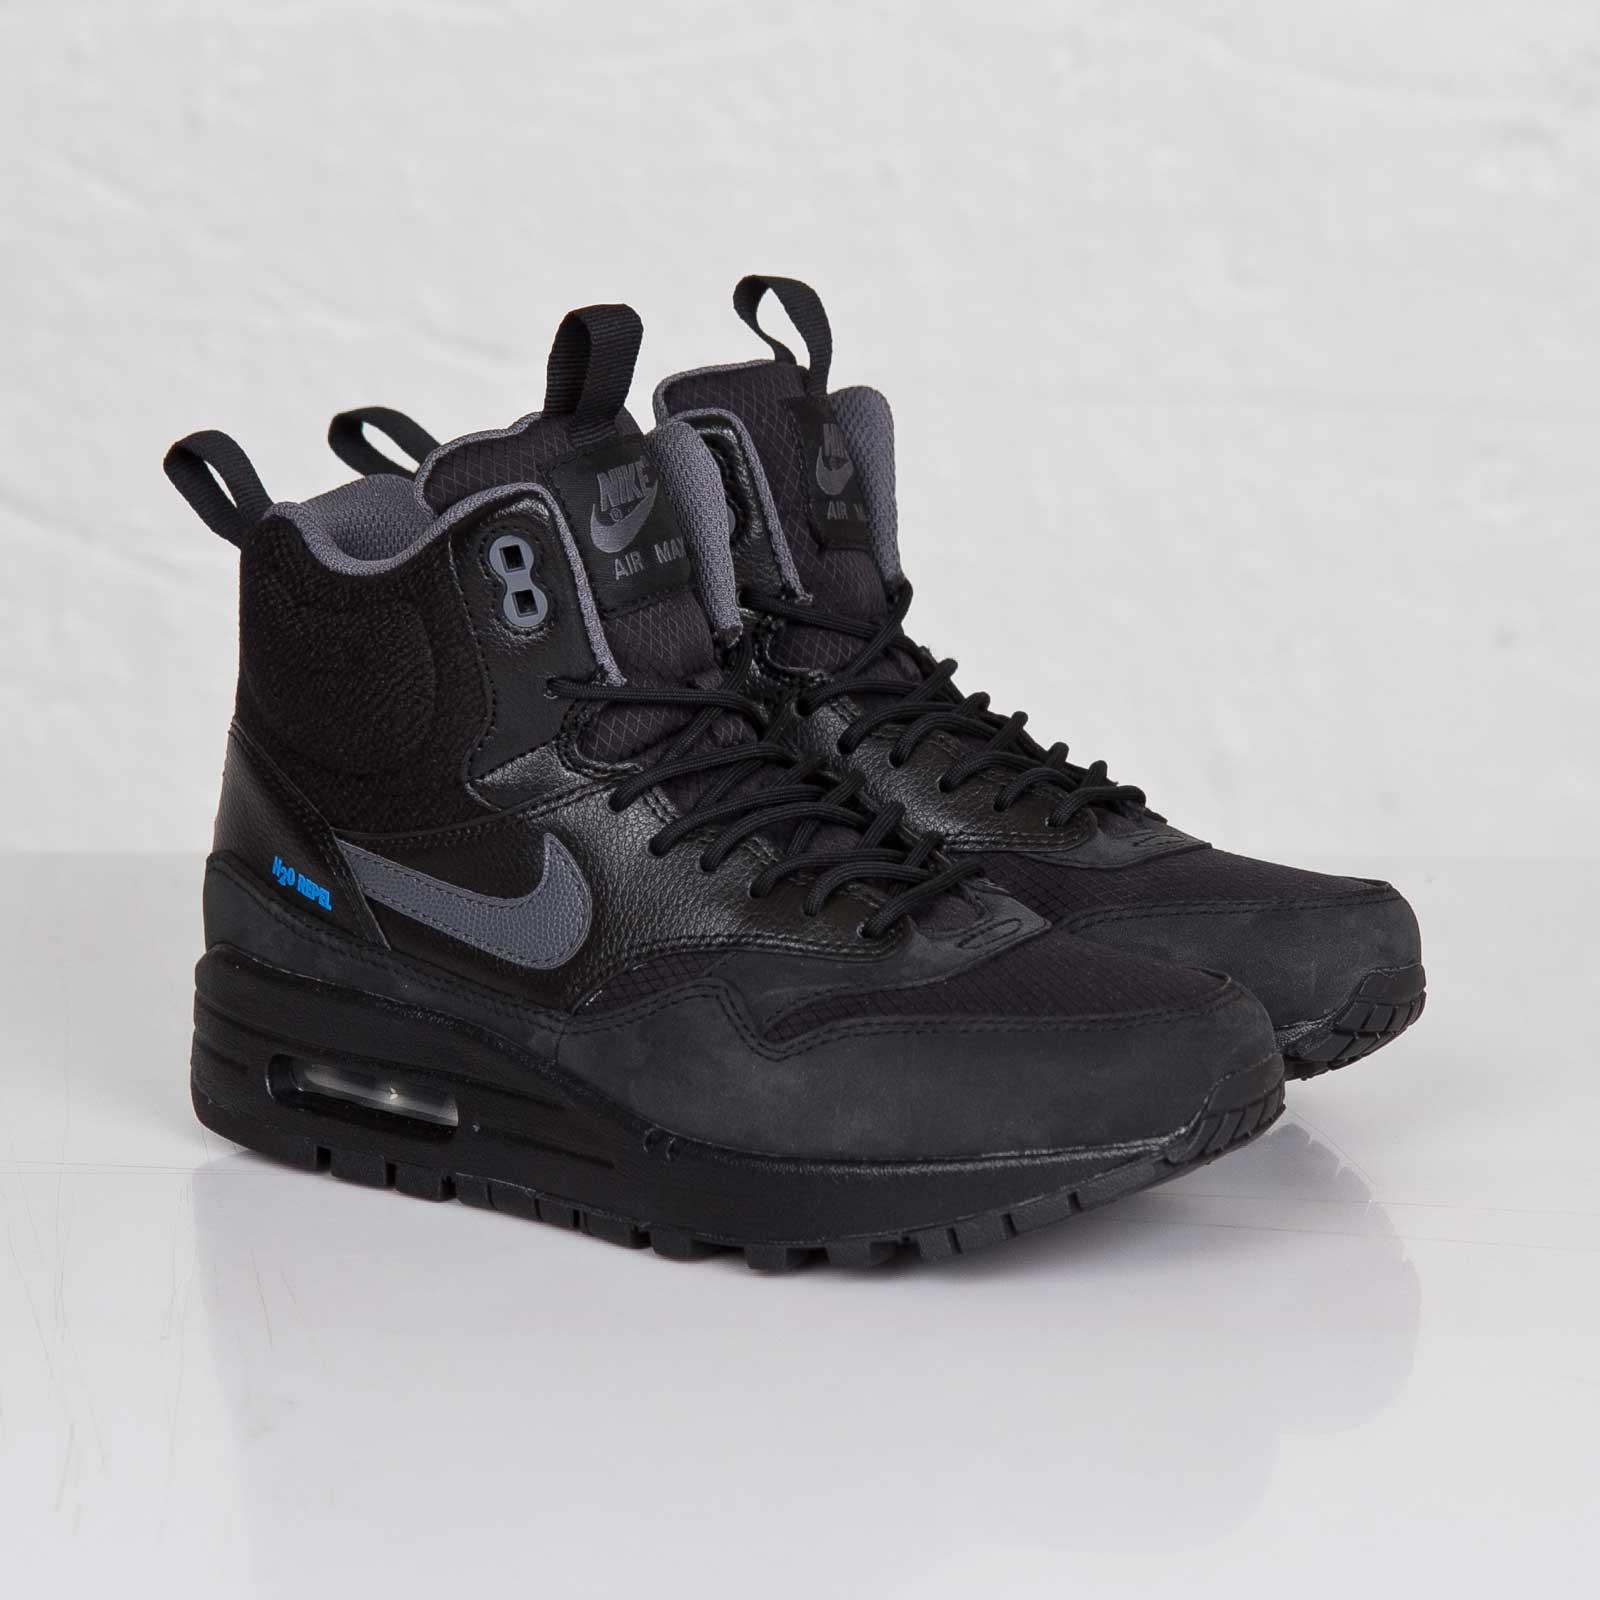 Nike WMNS Air Max 1 Mid Sneakerboot 685267 001